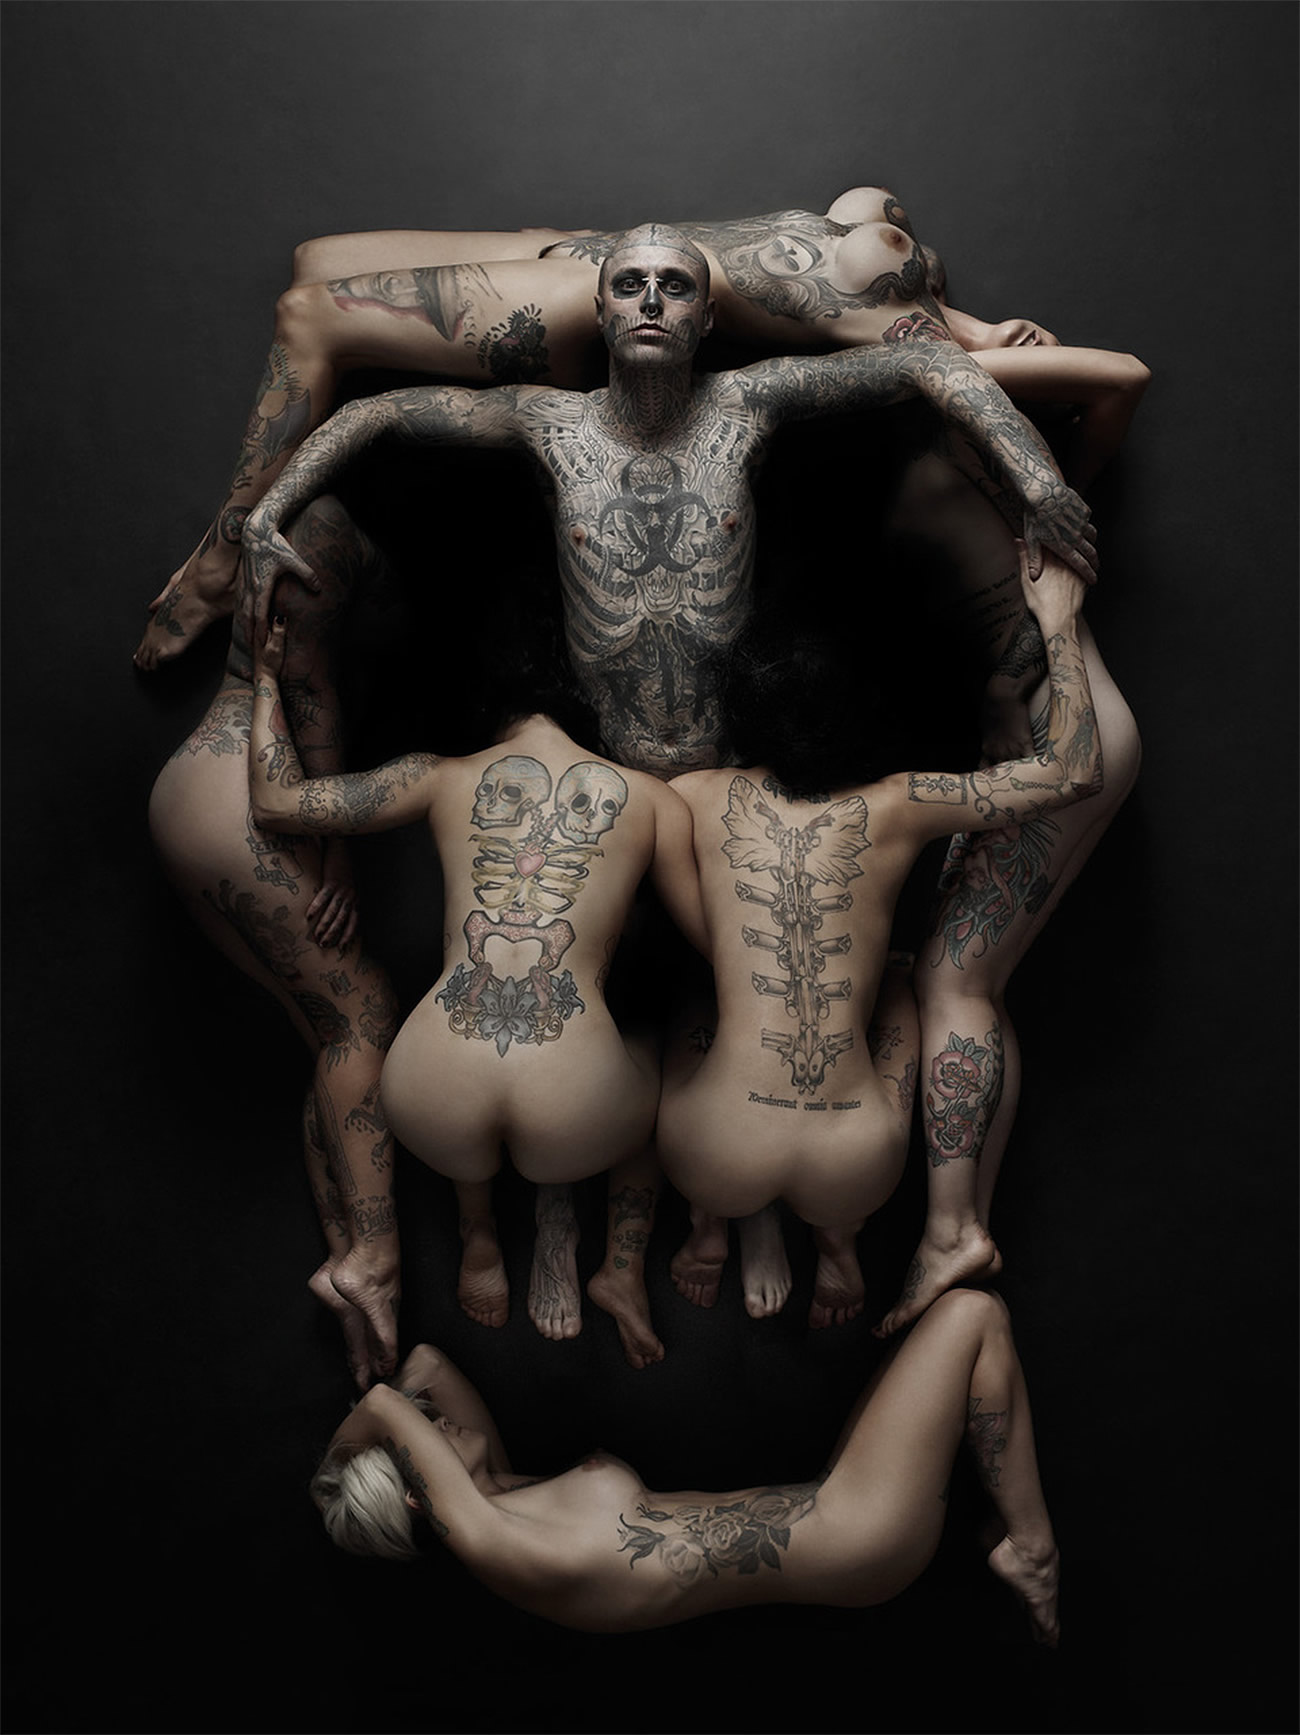 zombie-boy-rick-genest-photoshoot, dali, skull illusion, rick genest